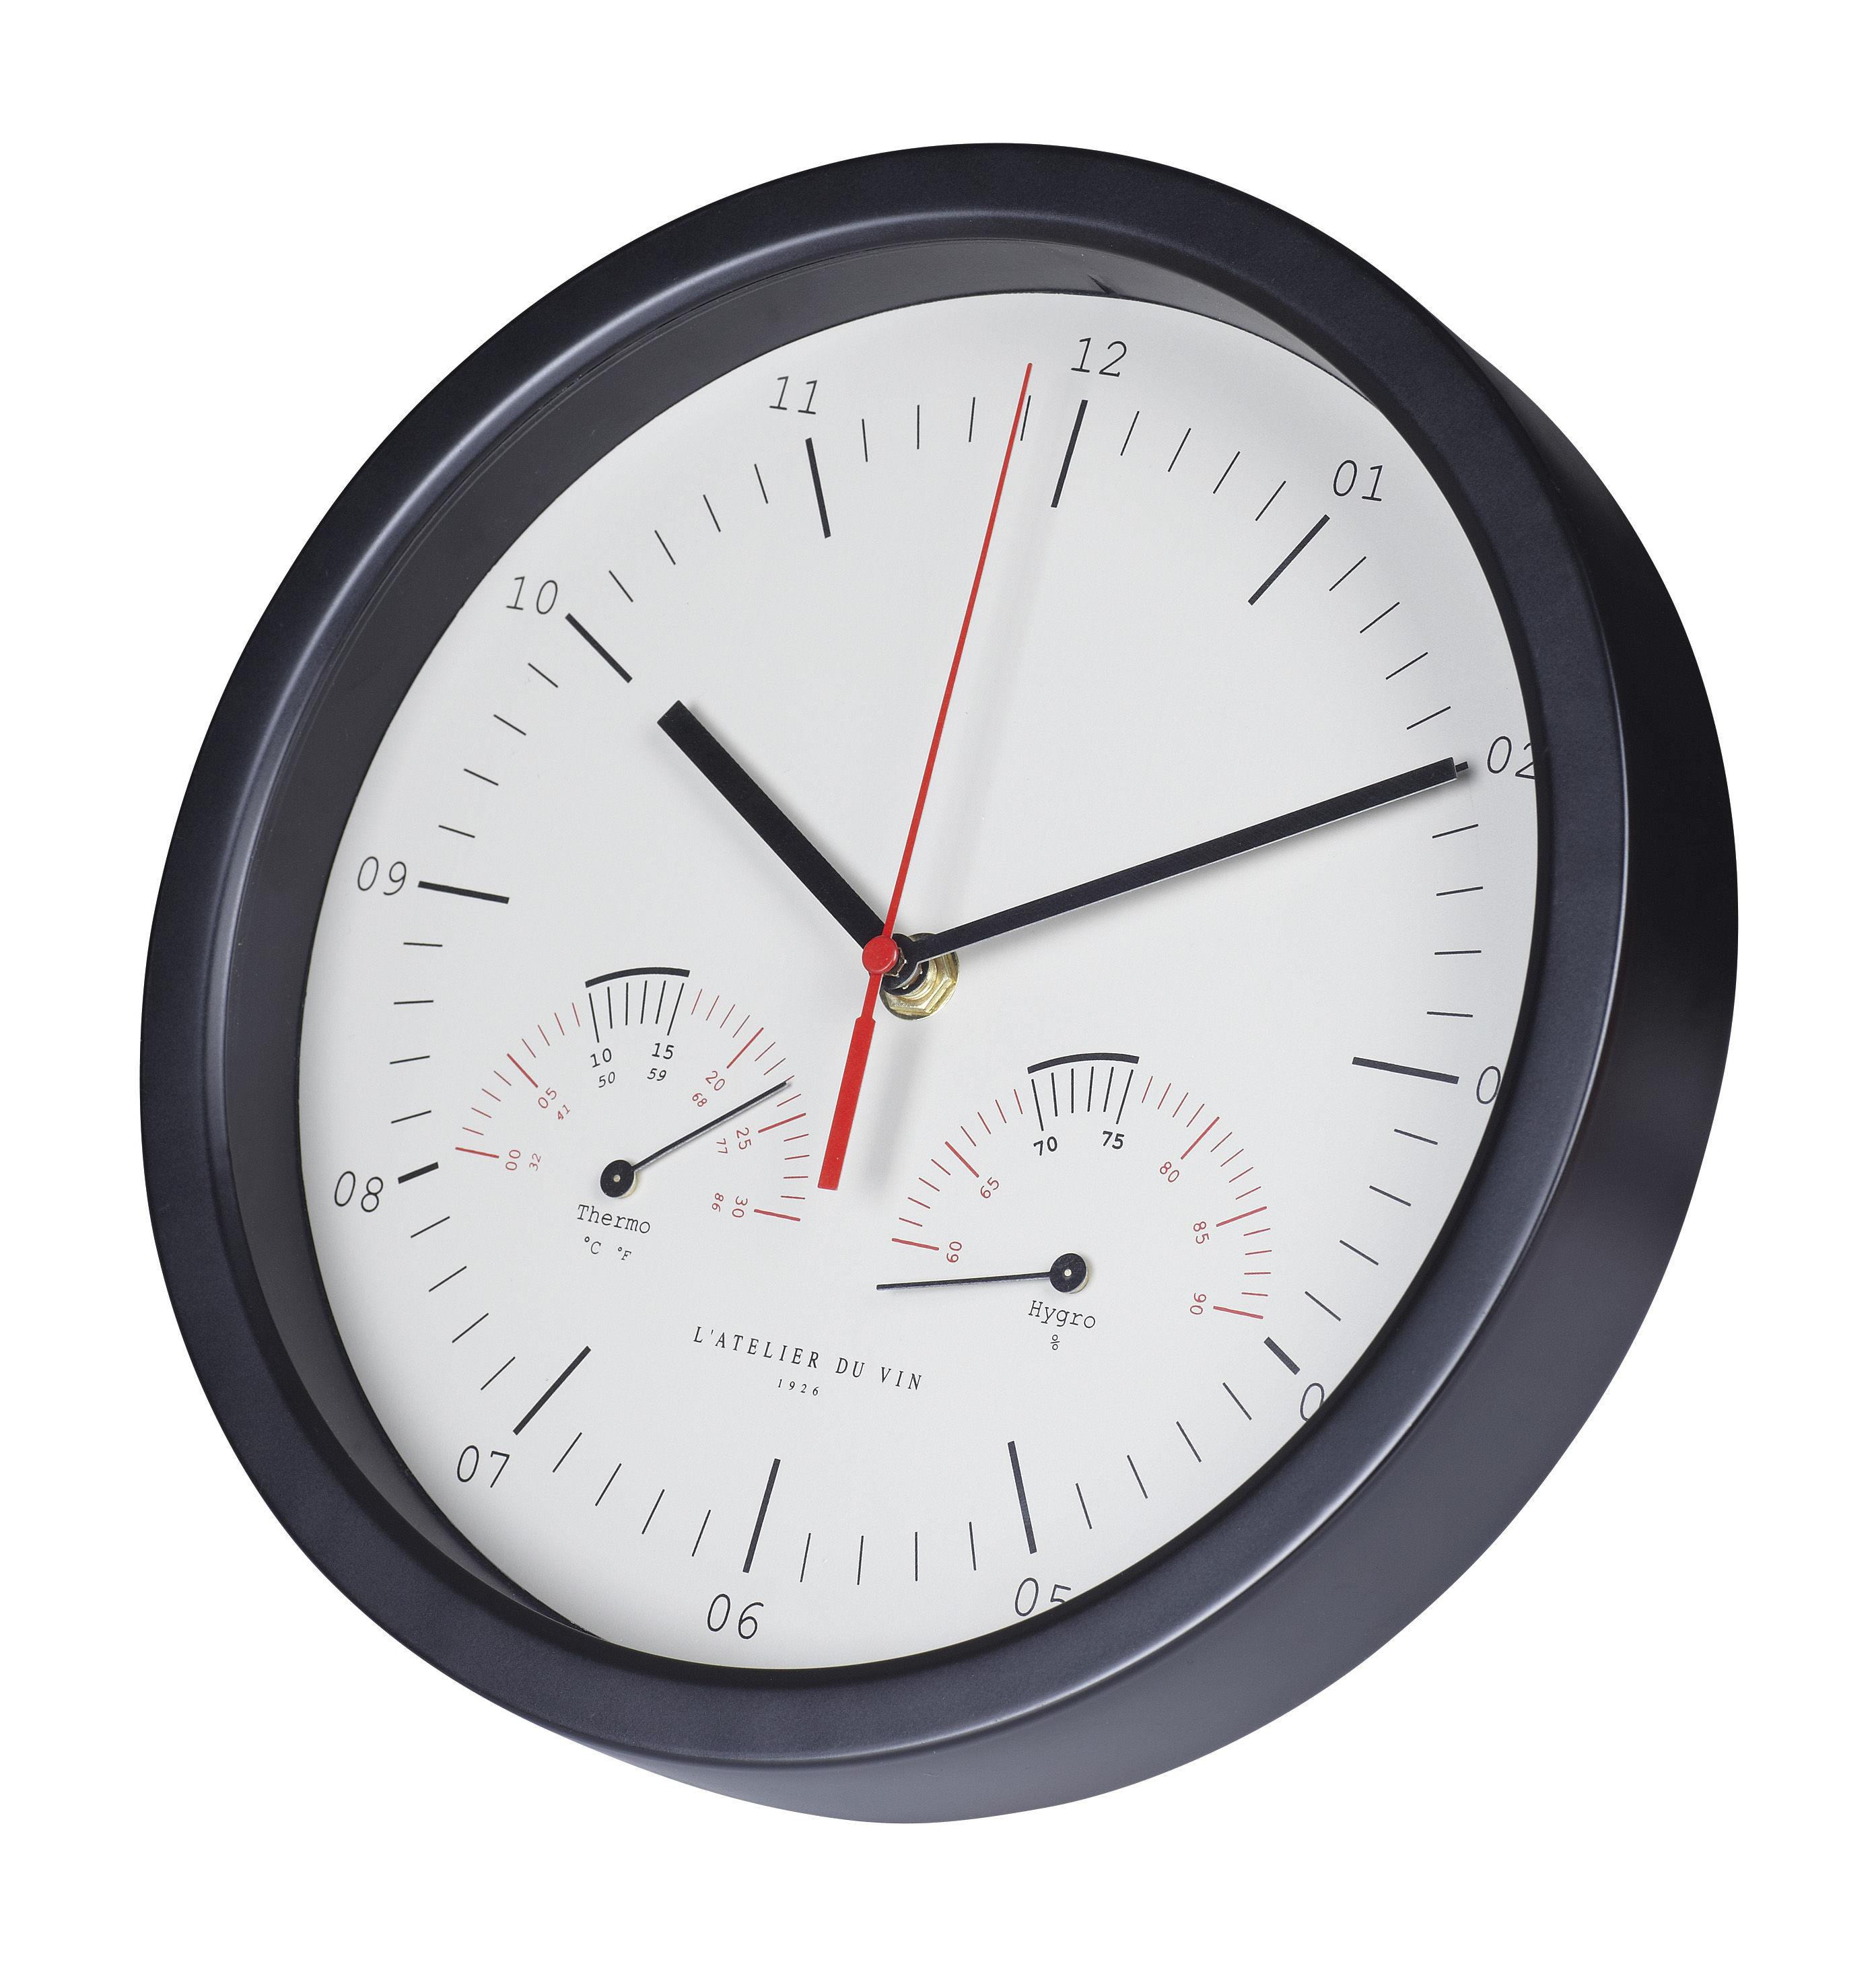 horloge murale hygro thermo mesure temp rature hygrom trie cadre noir fond blanc l. Black Bedroom Furniture Sets. Home Design Ideas